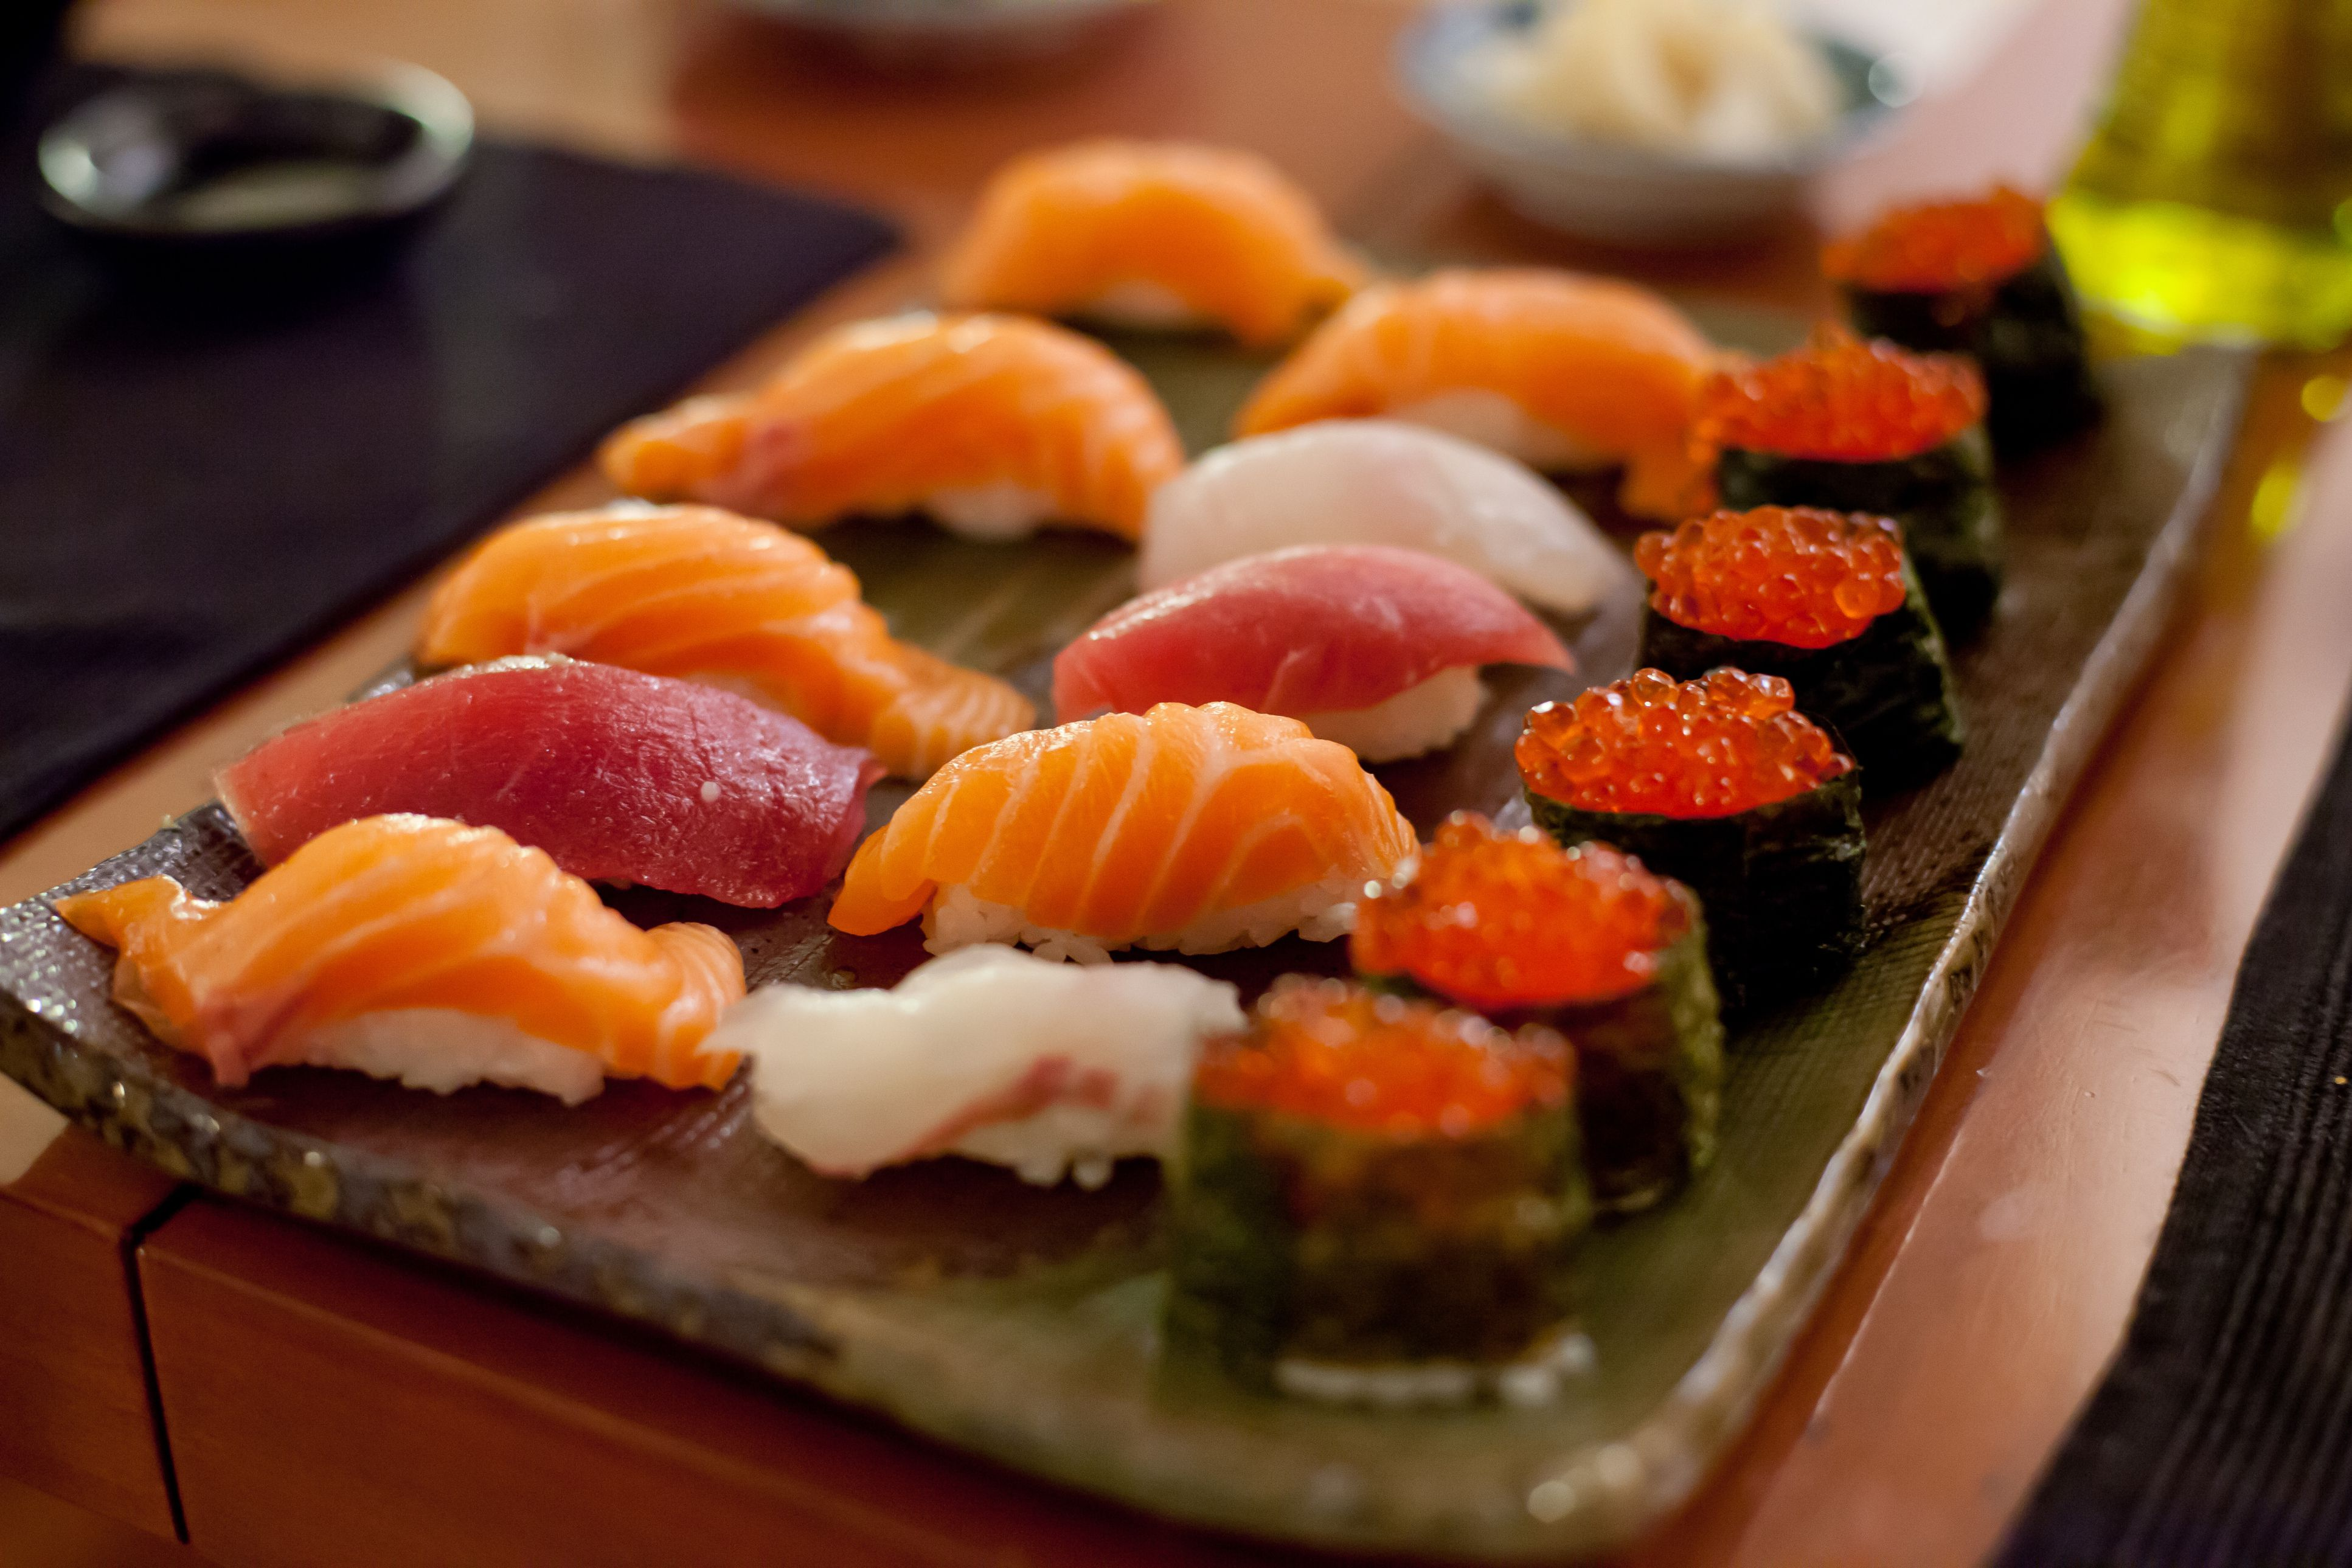 https://fthmb.tqn.com/7lP7IHB9BTUzAv57vtCxVq9I_vw=/3867x2578/filters:fill(auto,1)/sushi-plate-56a378d33df78cf7727d84f9.jpg